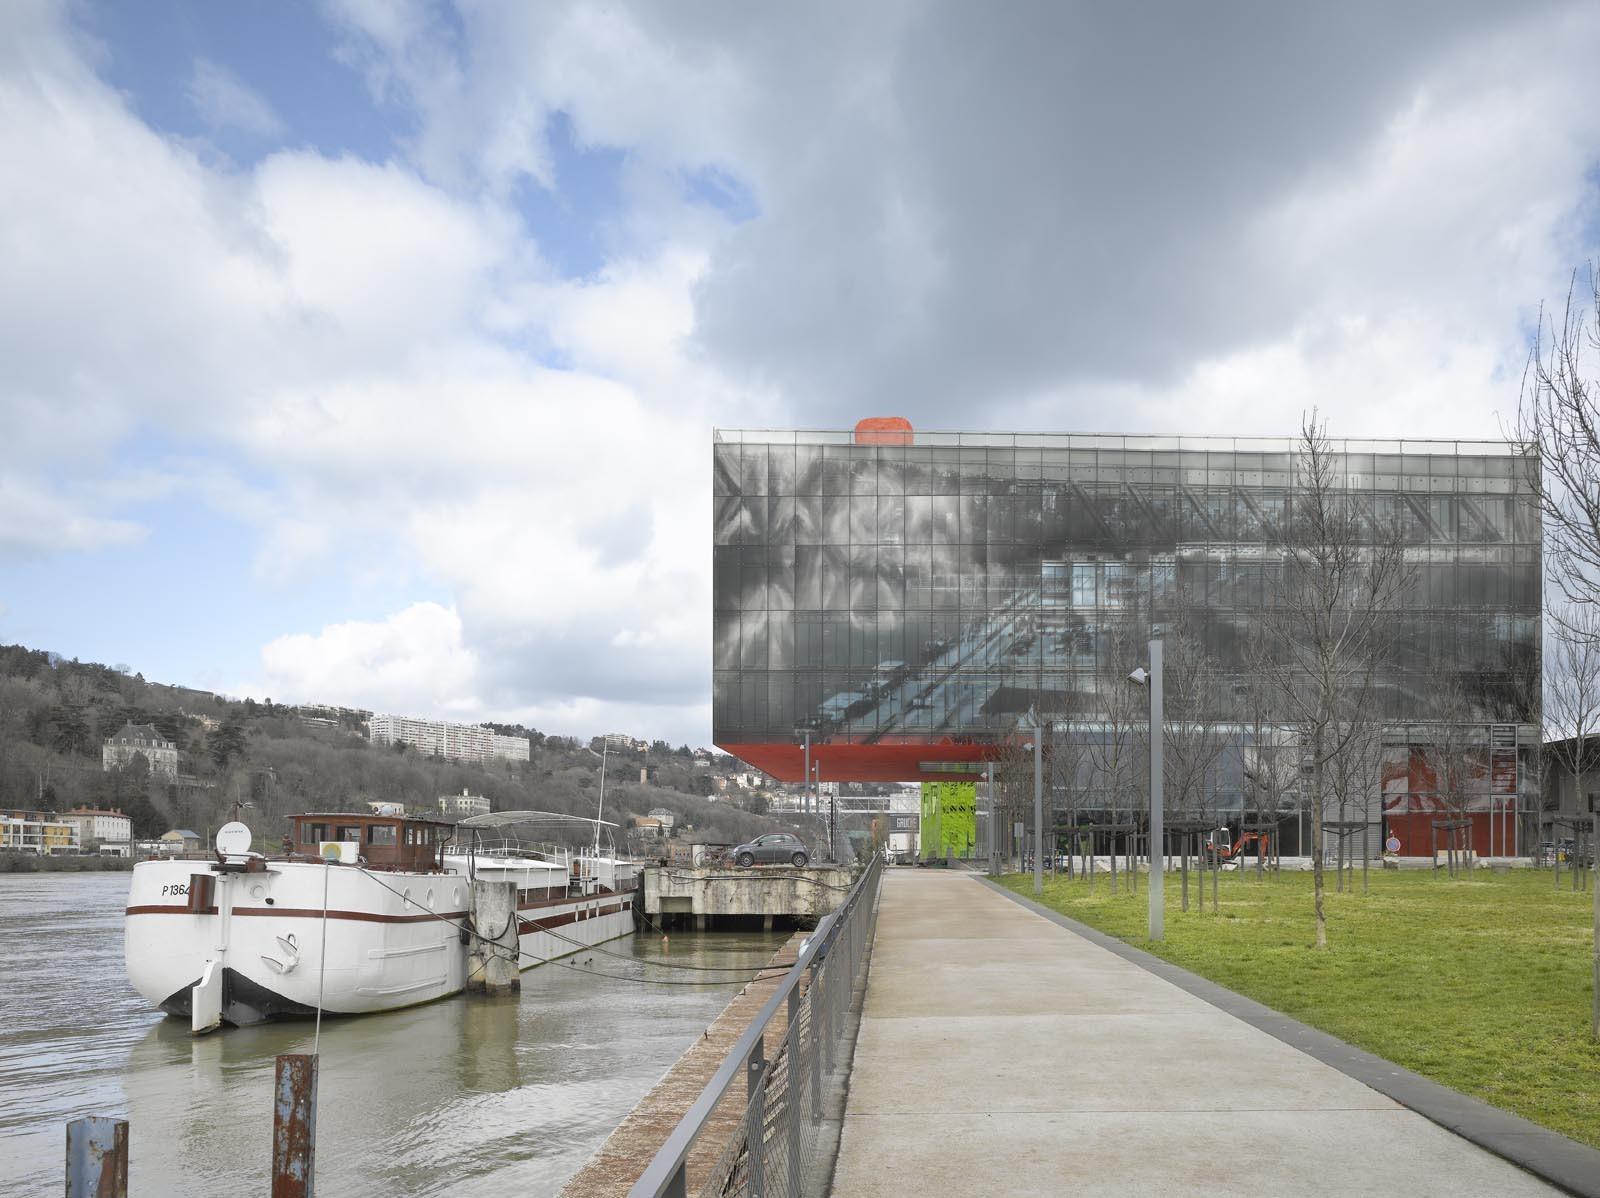 GL Events Headquarters / Studio Odile Decq, © Roland Halbe